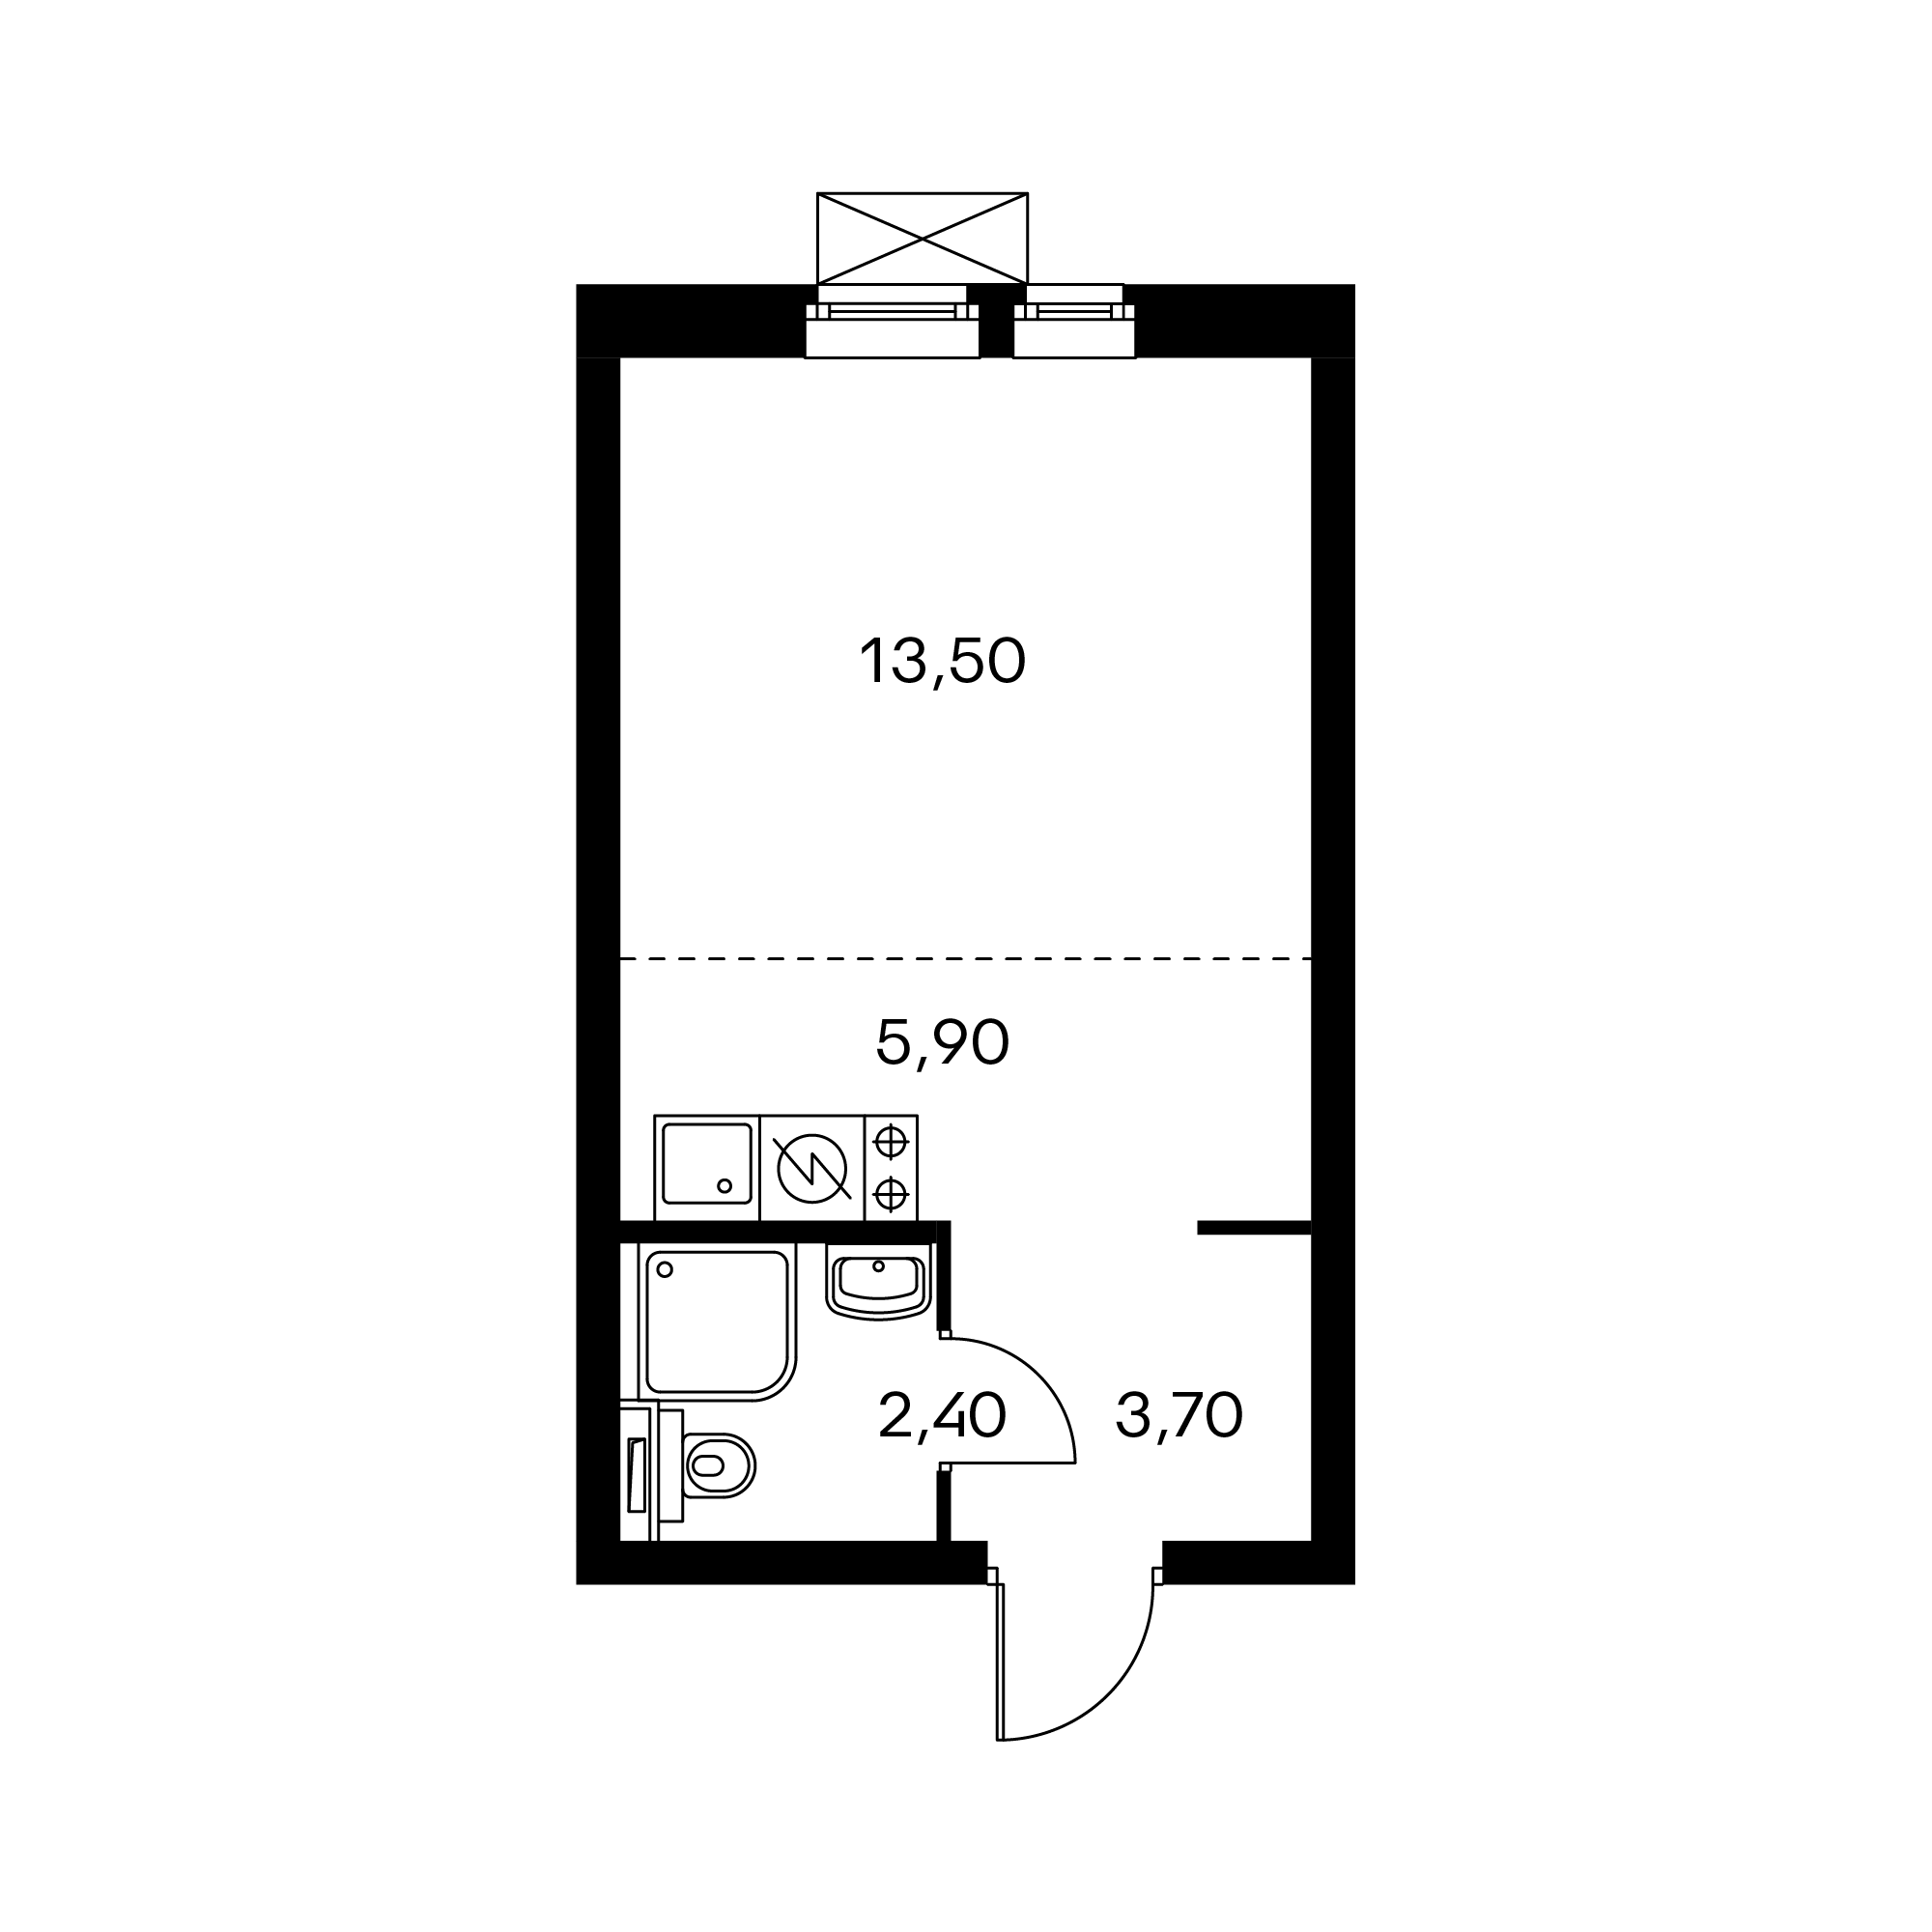 1NM1_4.2